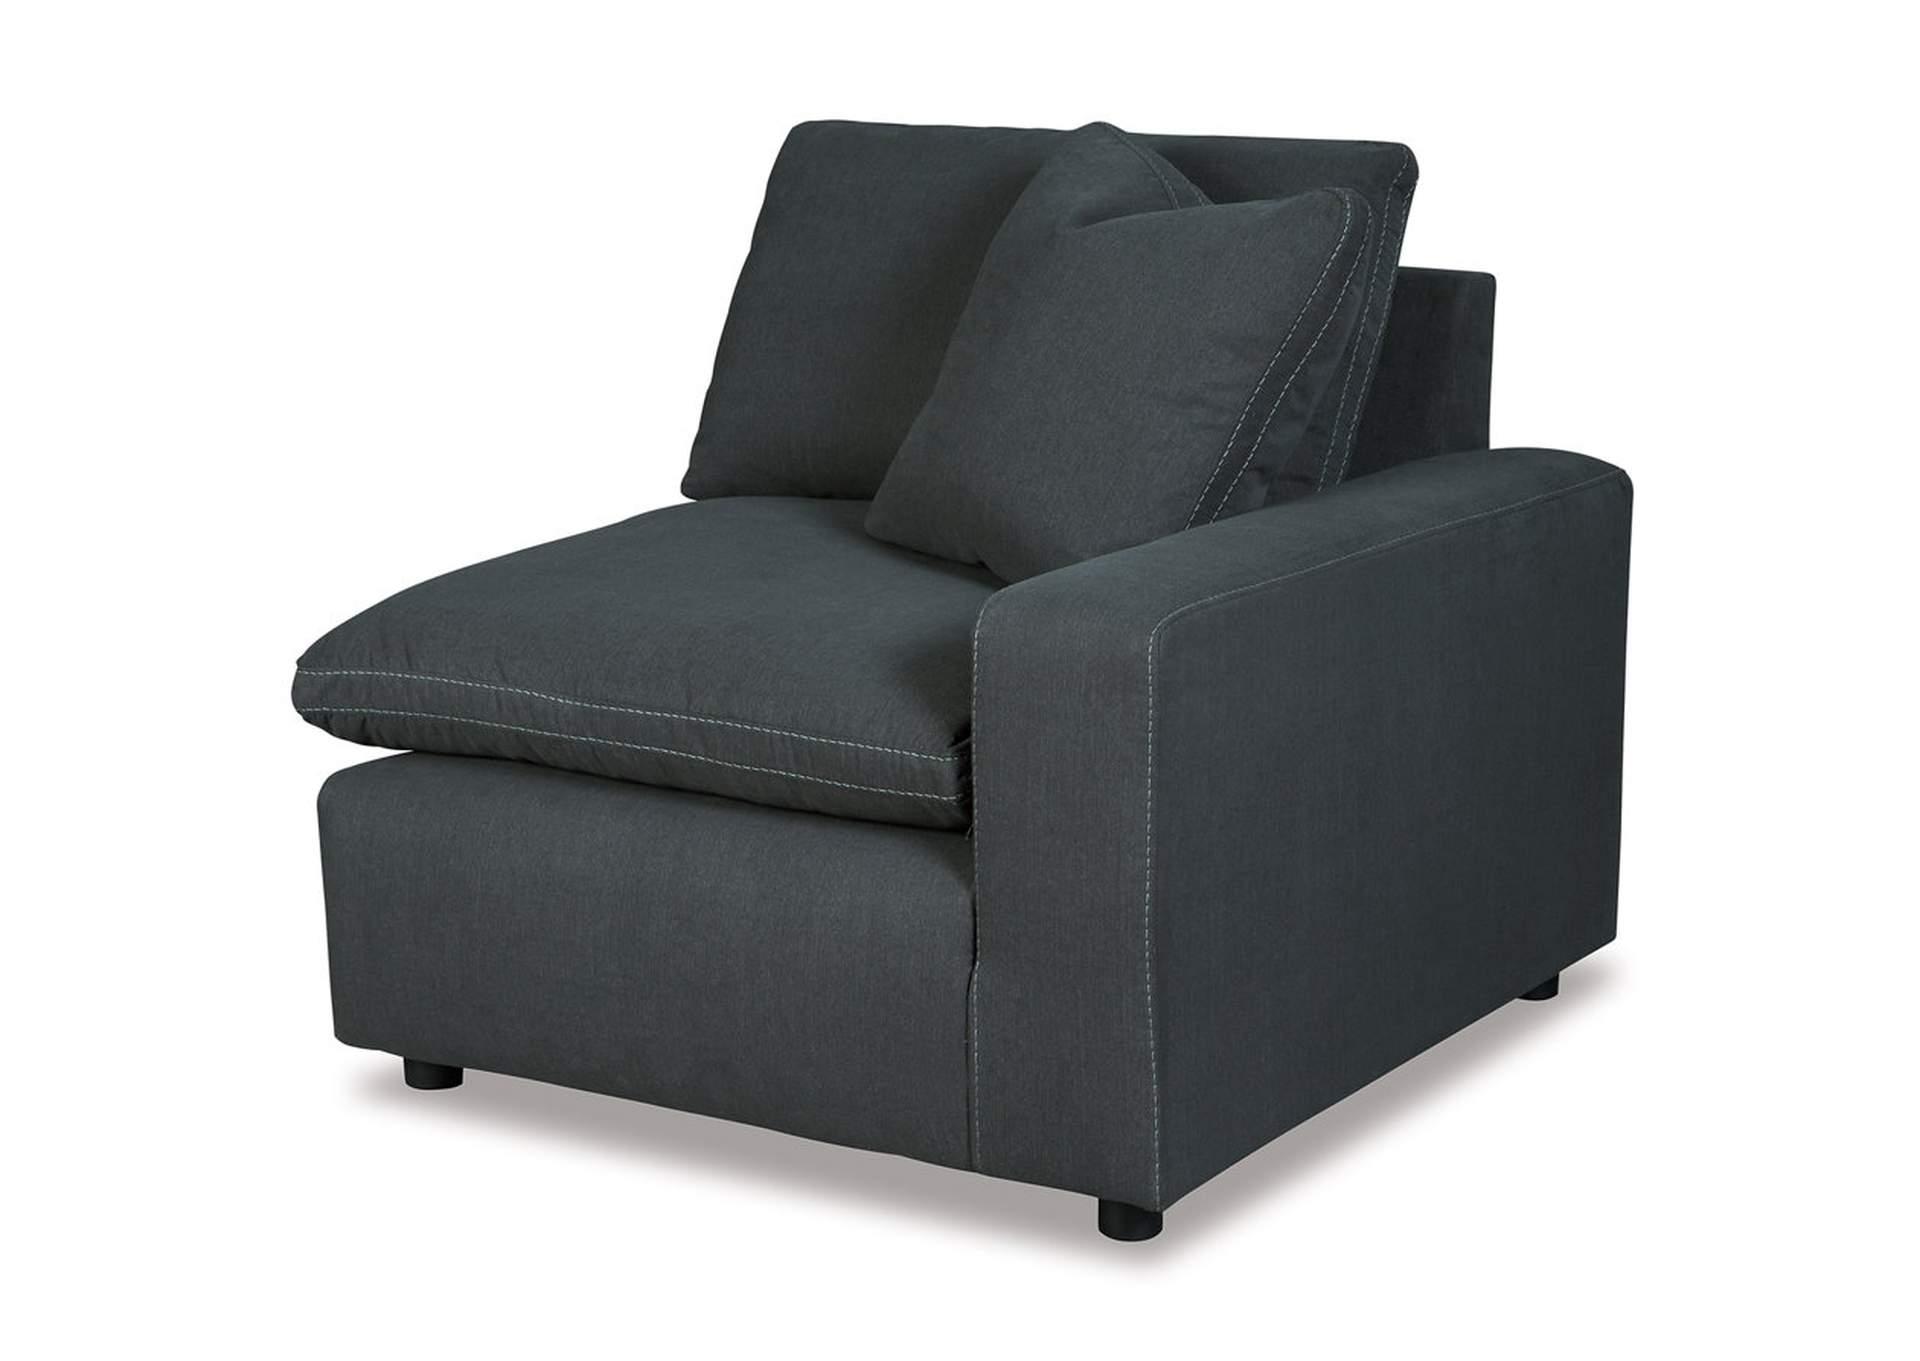 Savesto Corner Chair